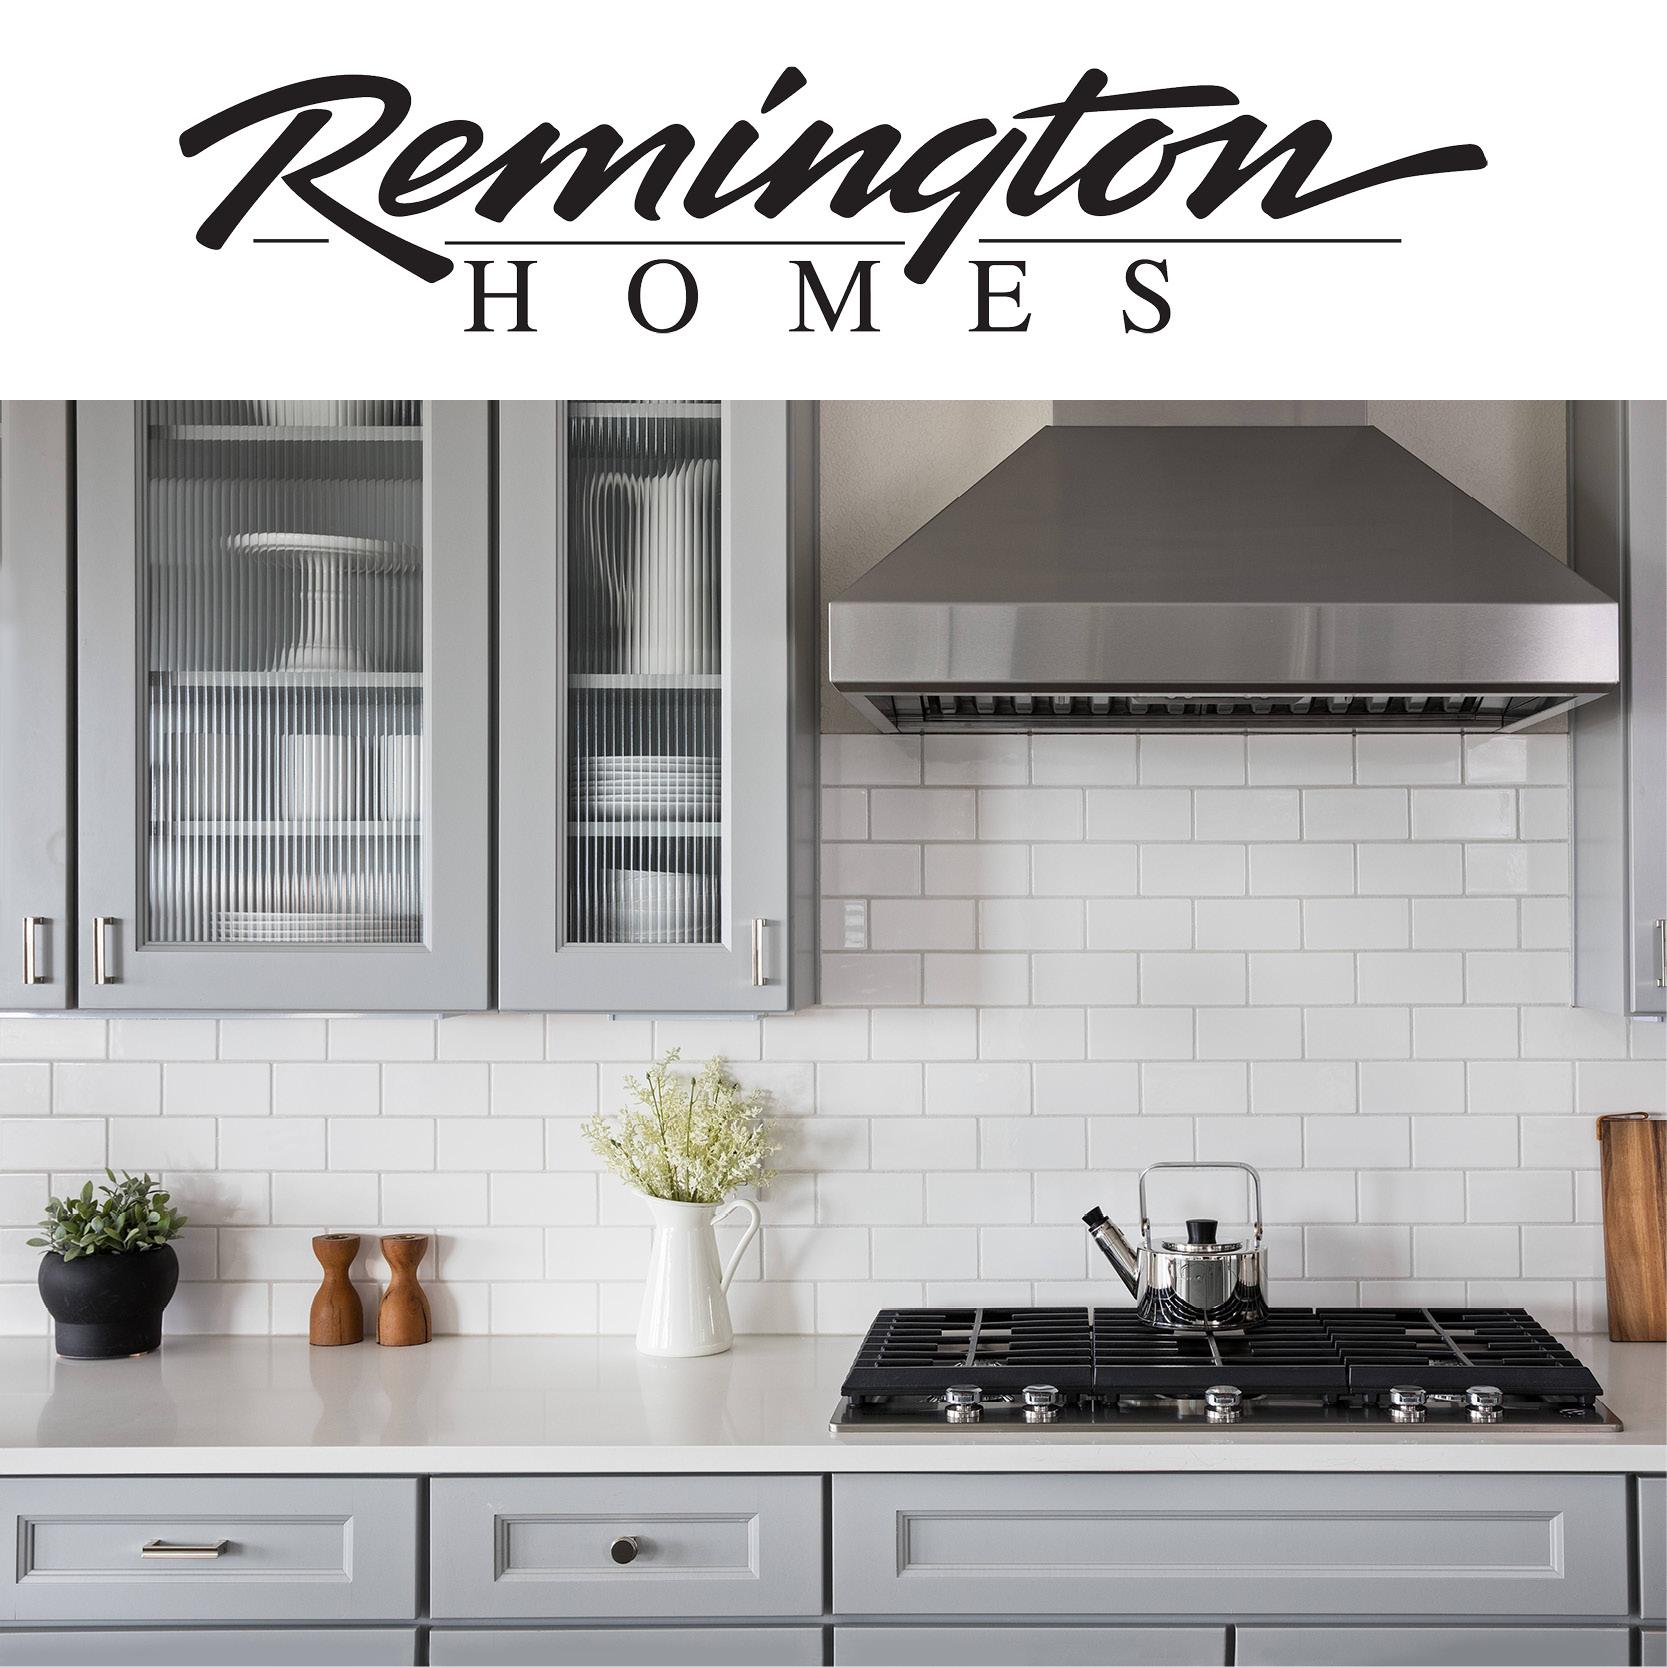 Remington Homes - Offices 5740 Olde Wadsworth Blvd, Arvada